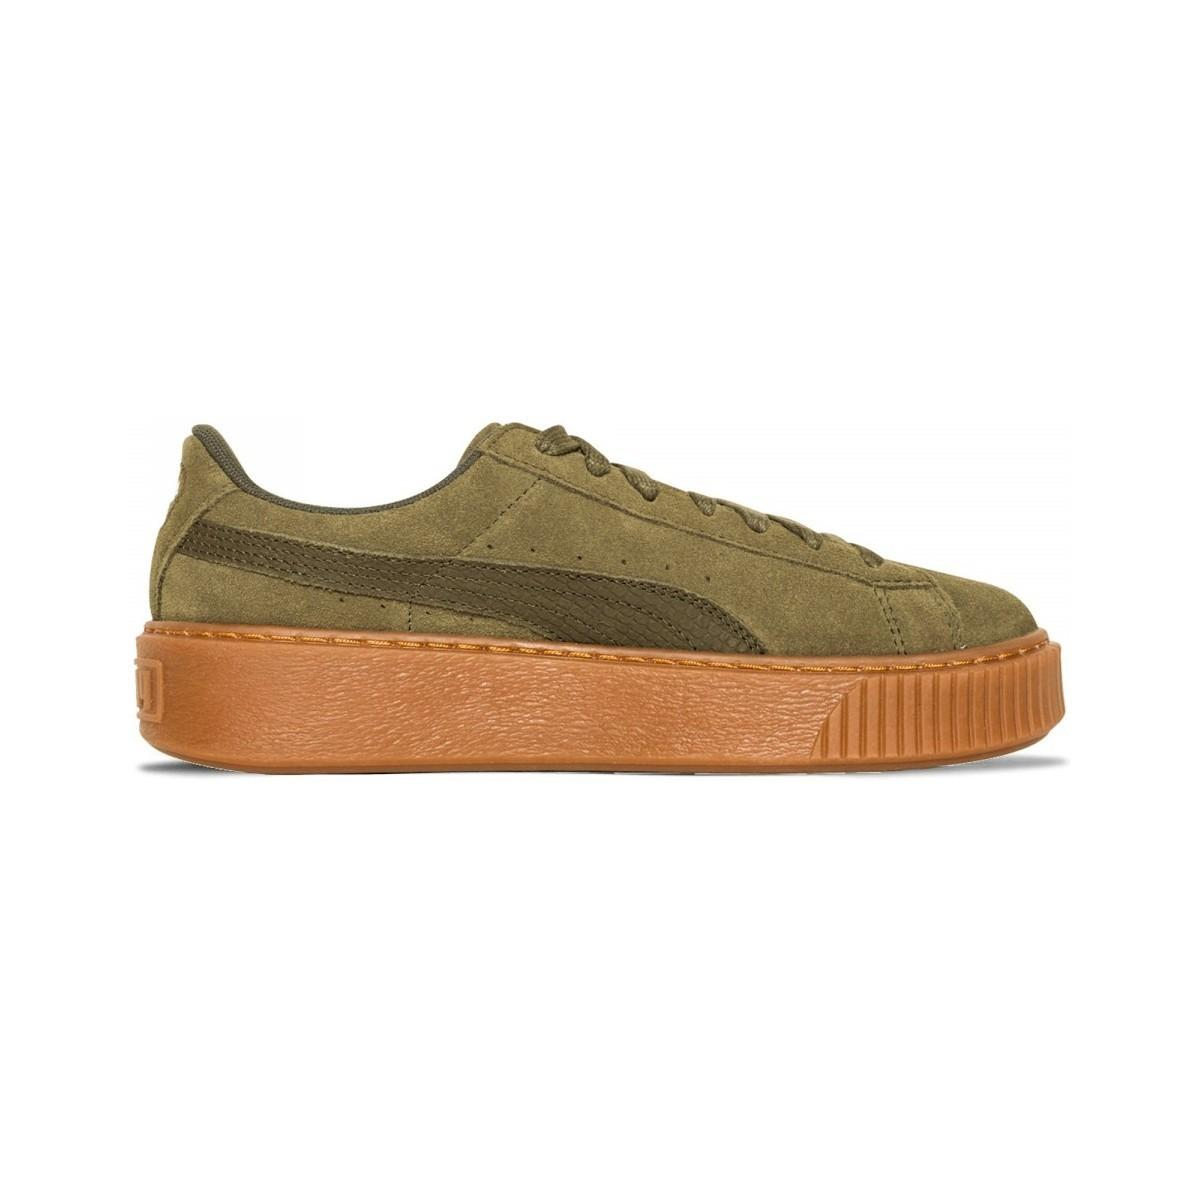 05fbb4138b0 Lyst - Basket Suede Platform - 365109-03 femmes Chaussures en vert ...